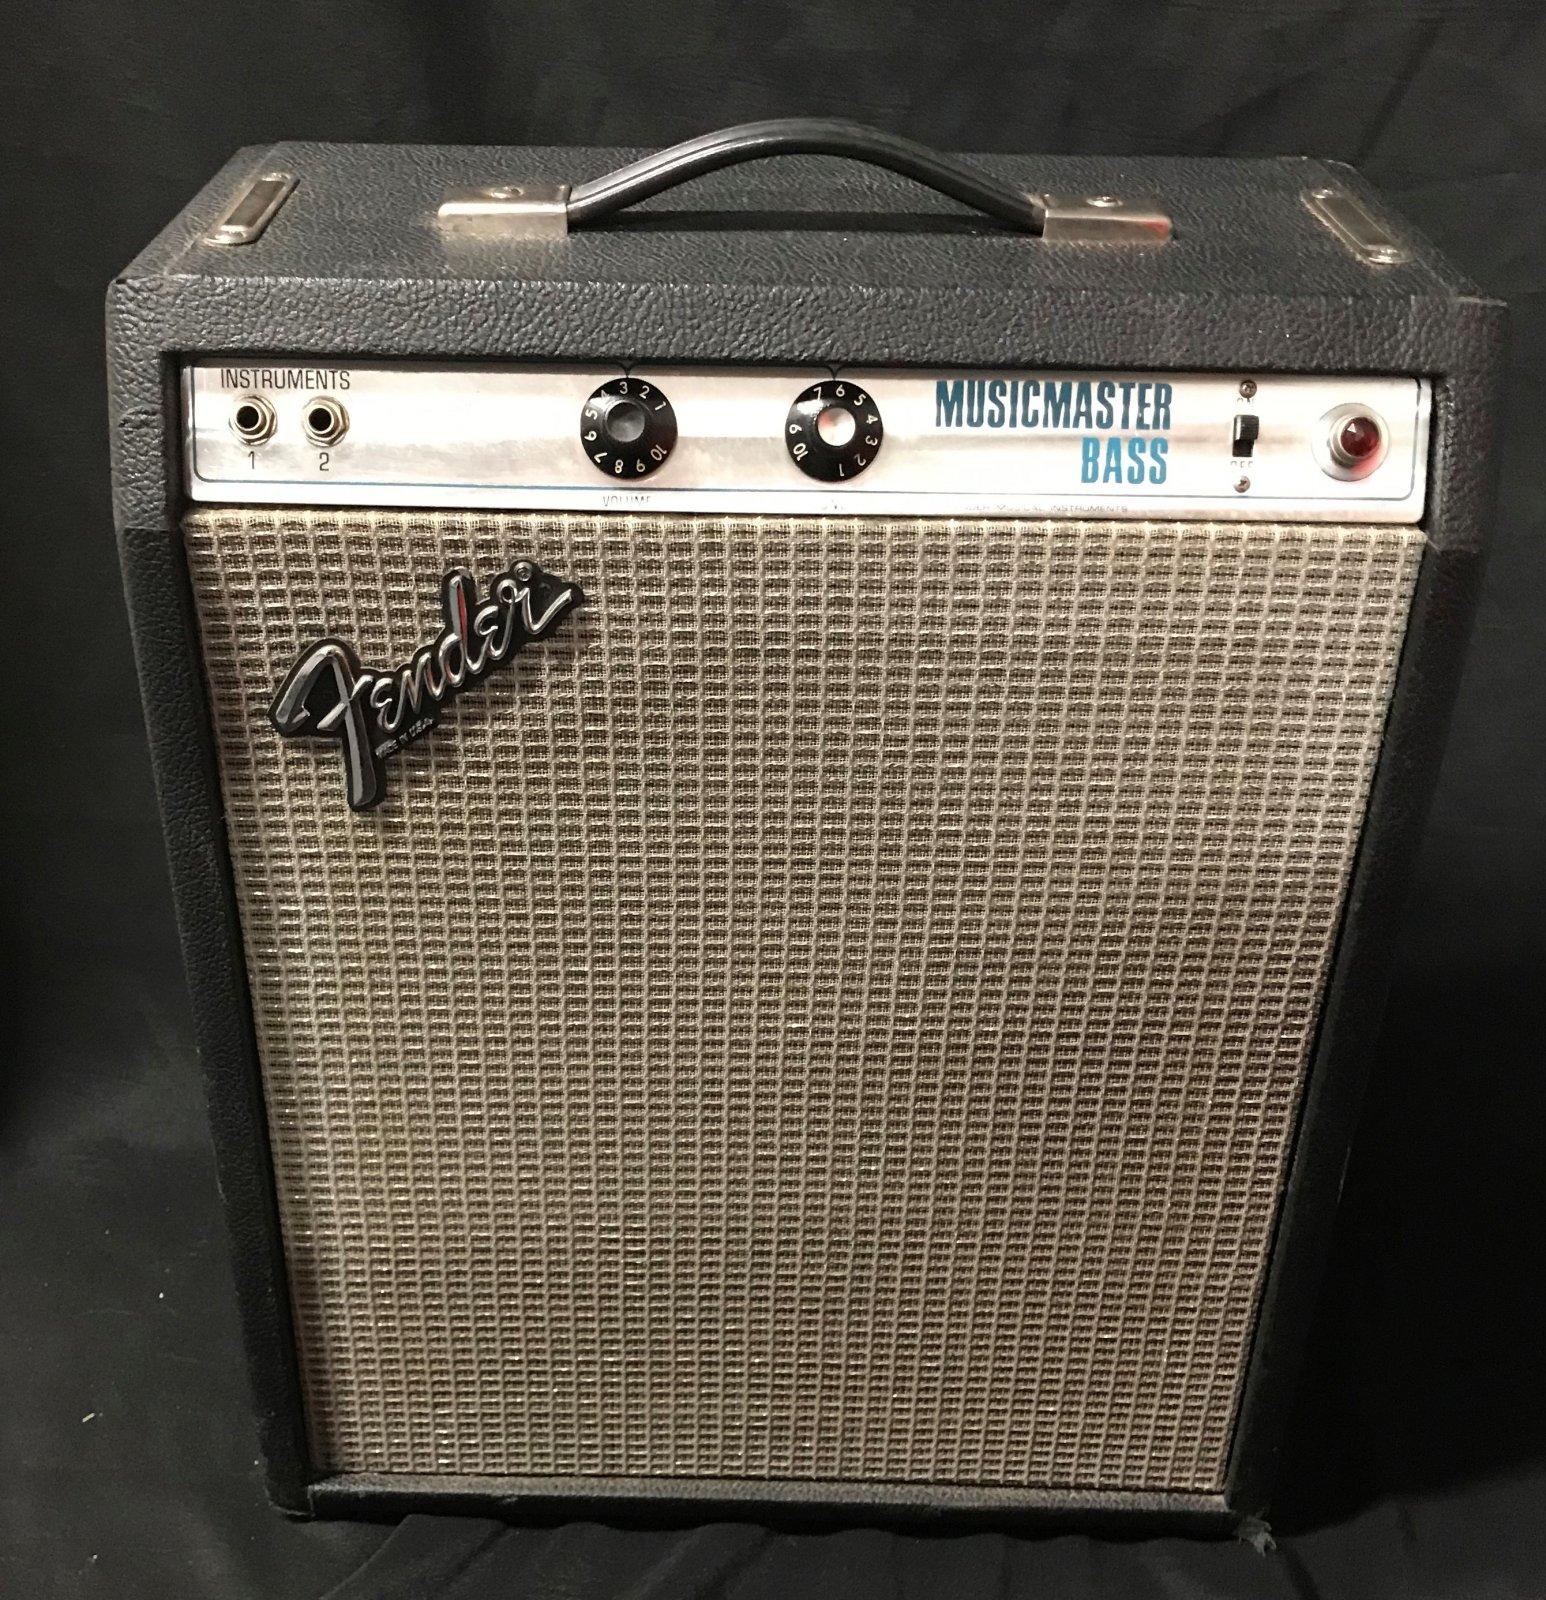 Used Fender Music Master Bass Amp